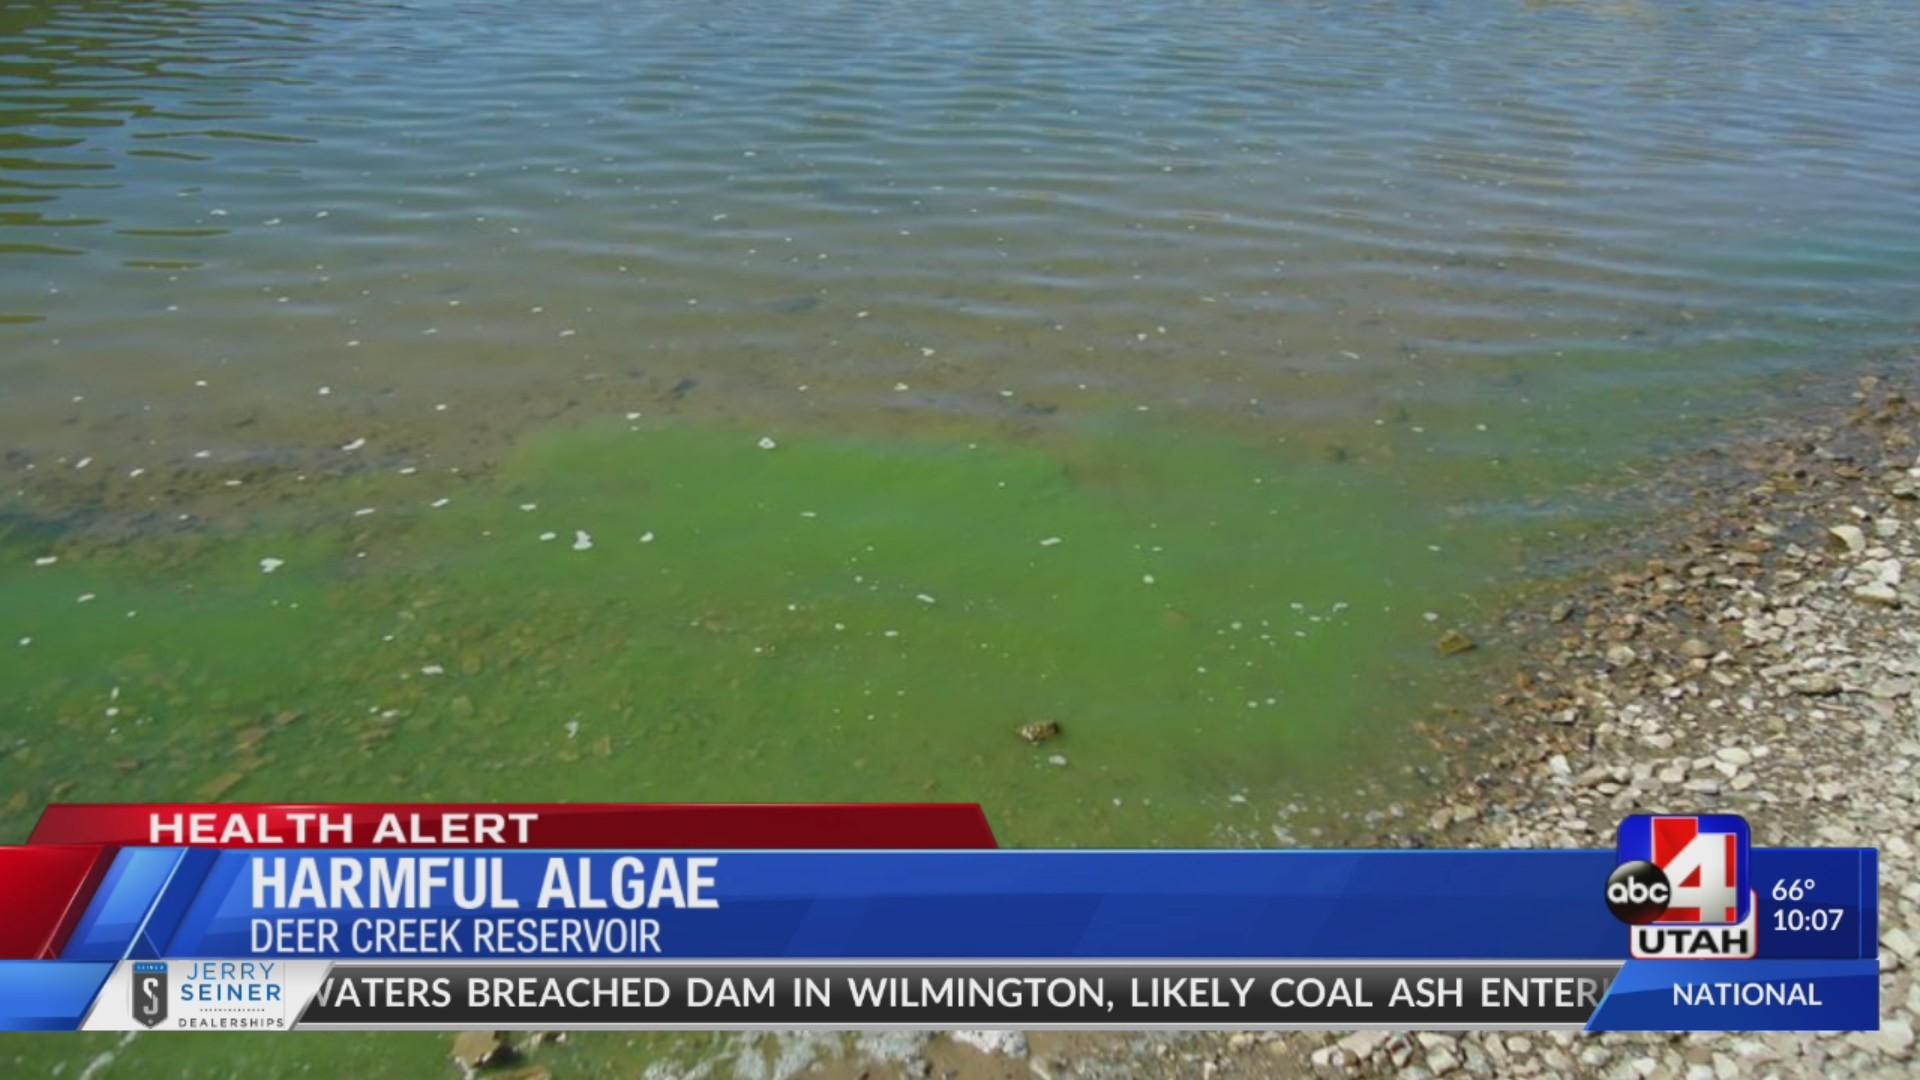 Harrmful_algae_detected_at_Deer_Creek_Re_0_20180922051207